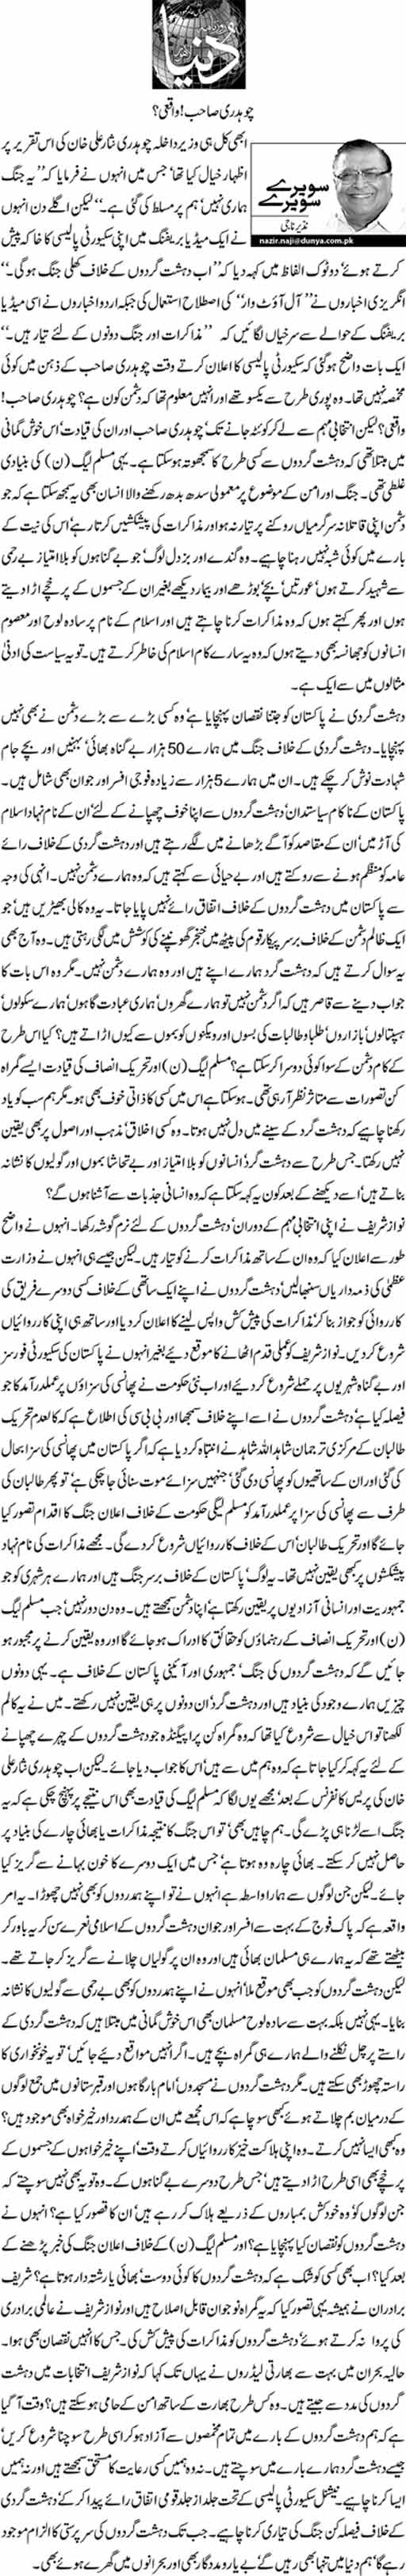 Chaudhry Sahib!Waqai? - Nazeer Naji